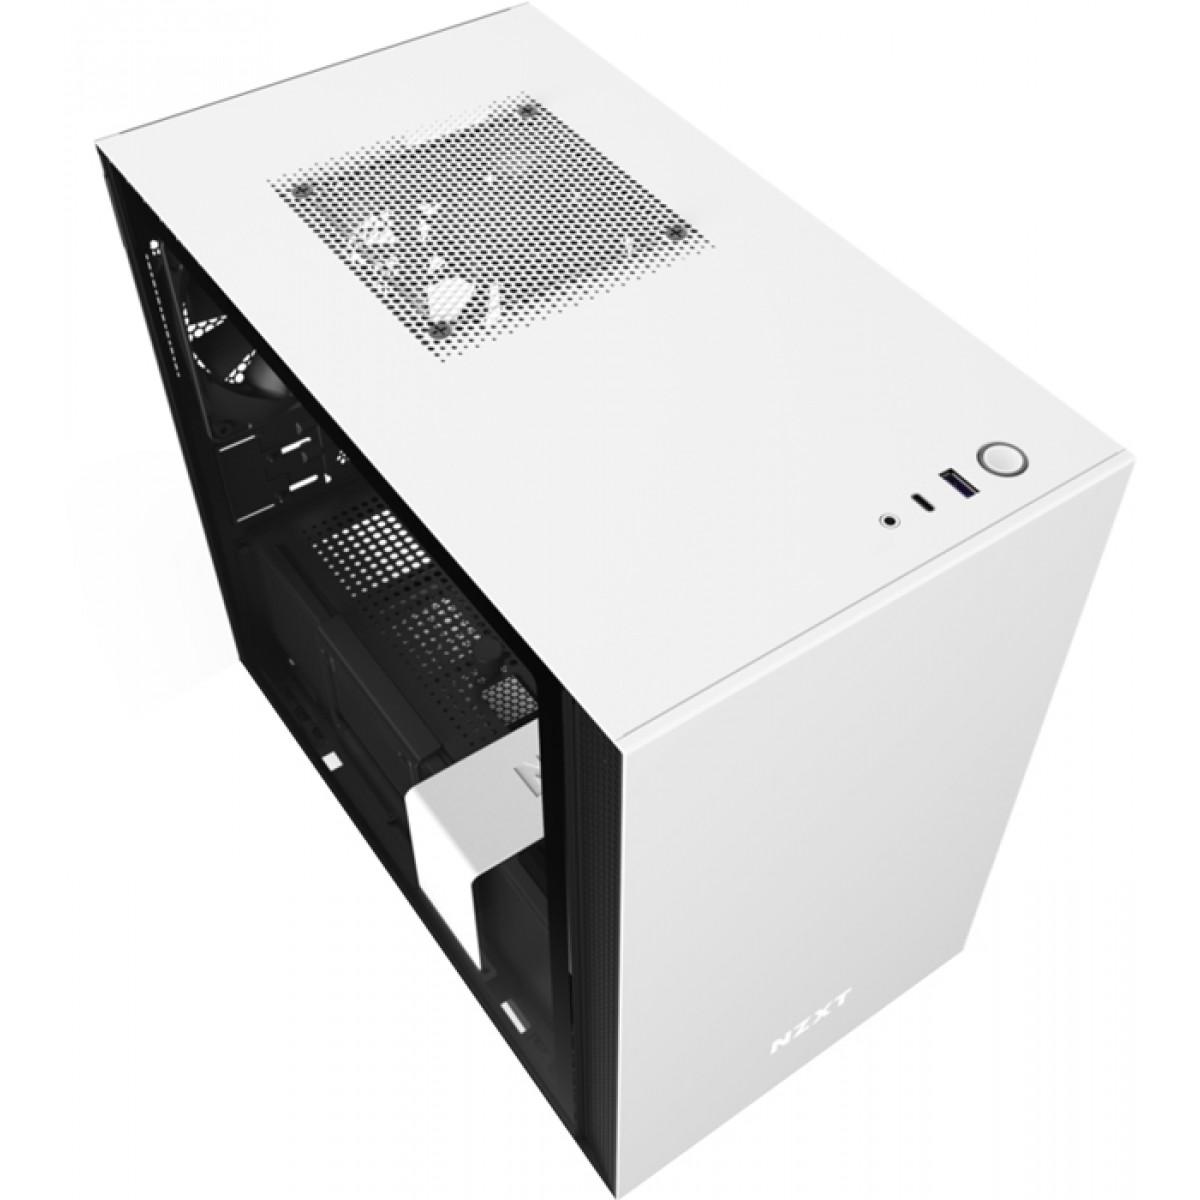 Gabinete Gamer NZXT H210, Mini Tower, Vidro Temperado, White, Sem Fonte, Com 2 Fans, CA-H210B-W1